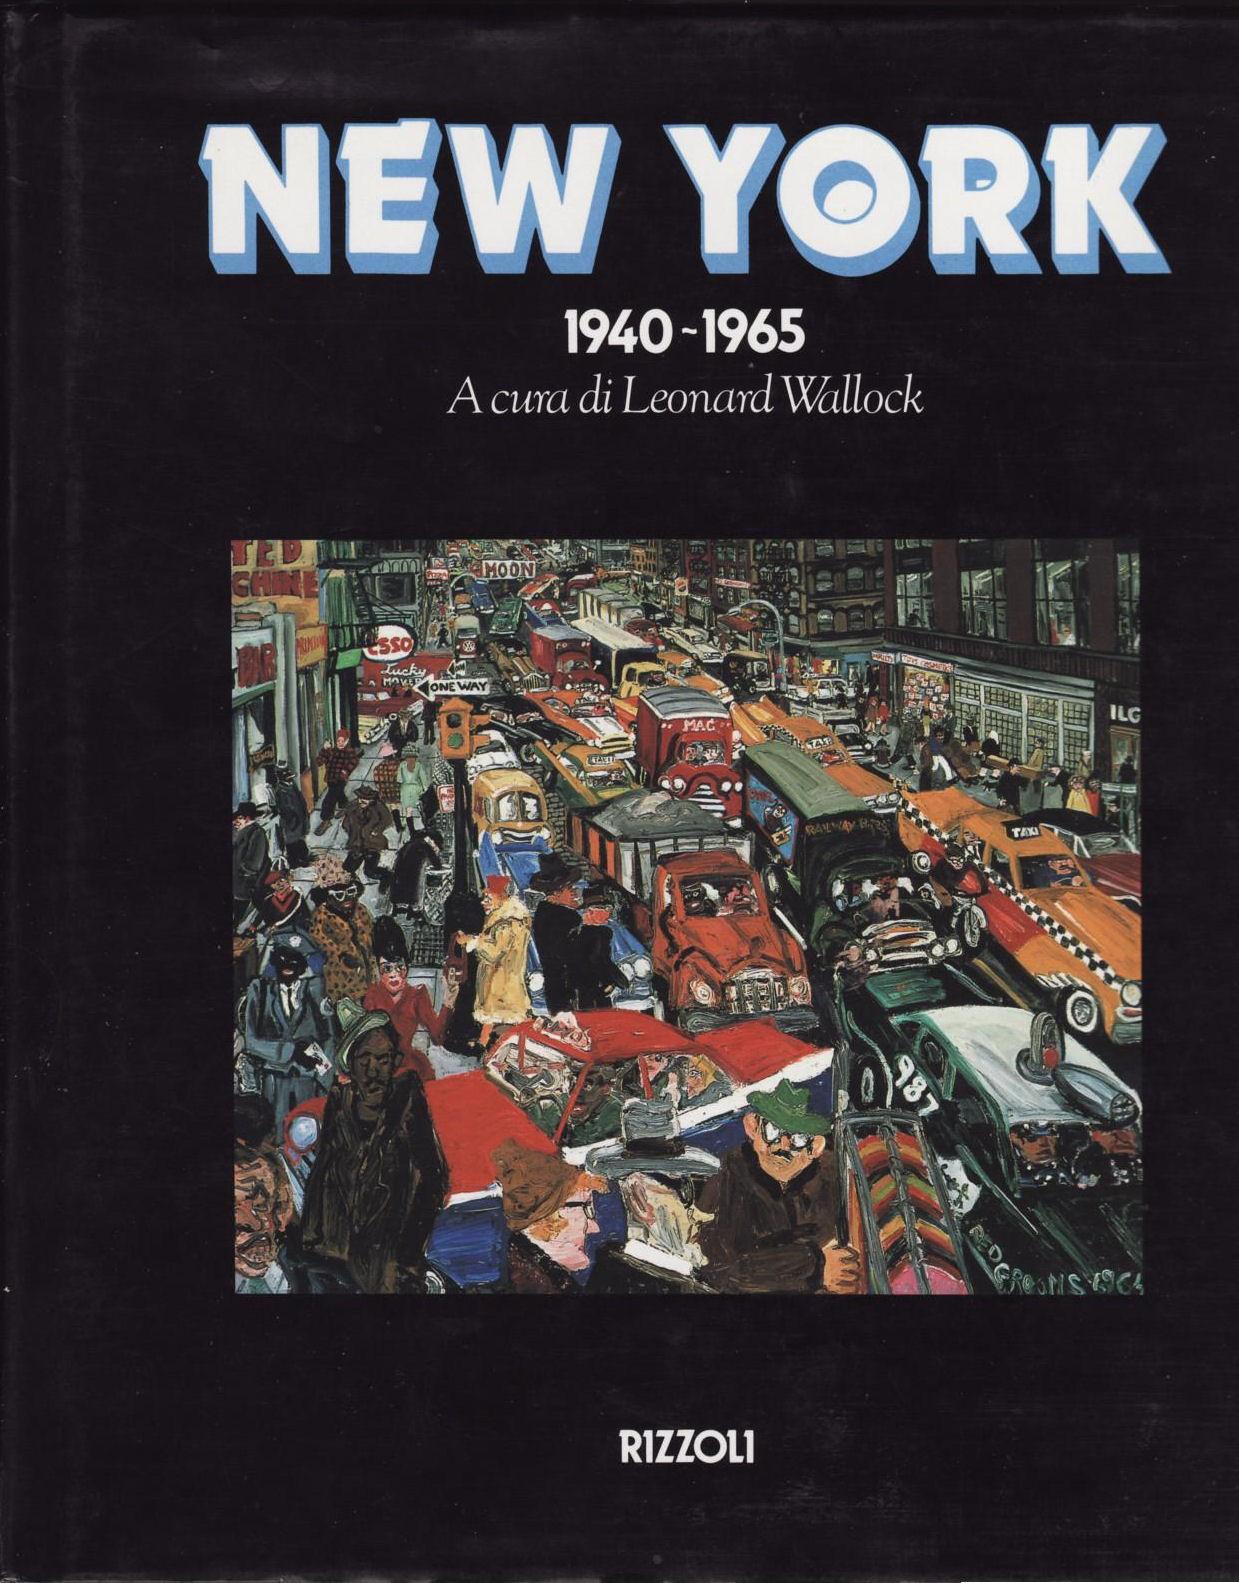 New York 1940-1965